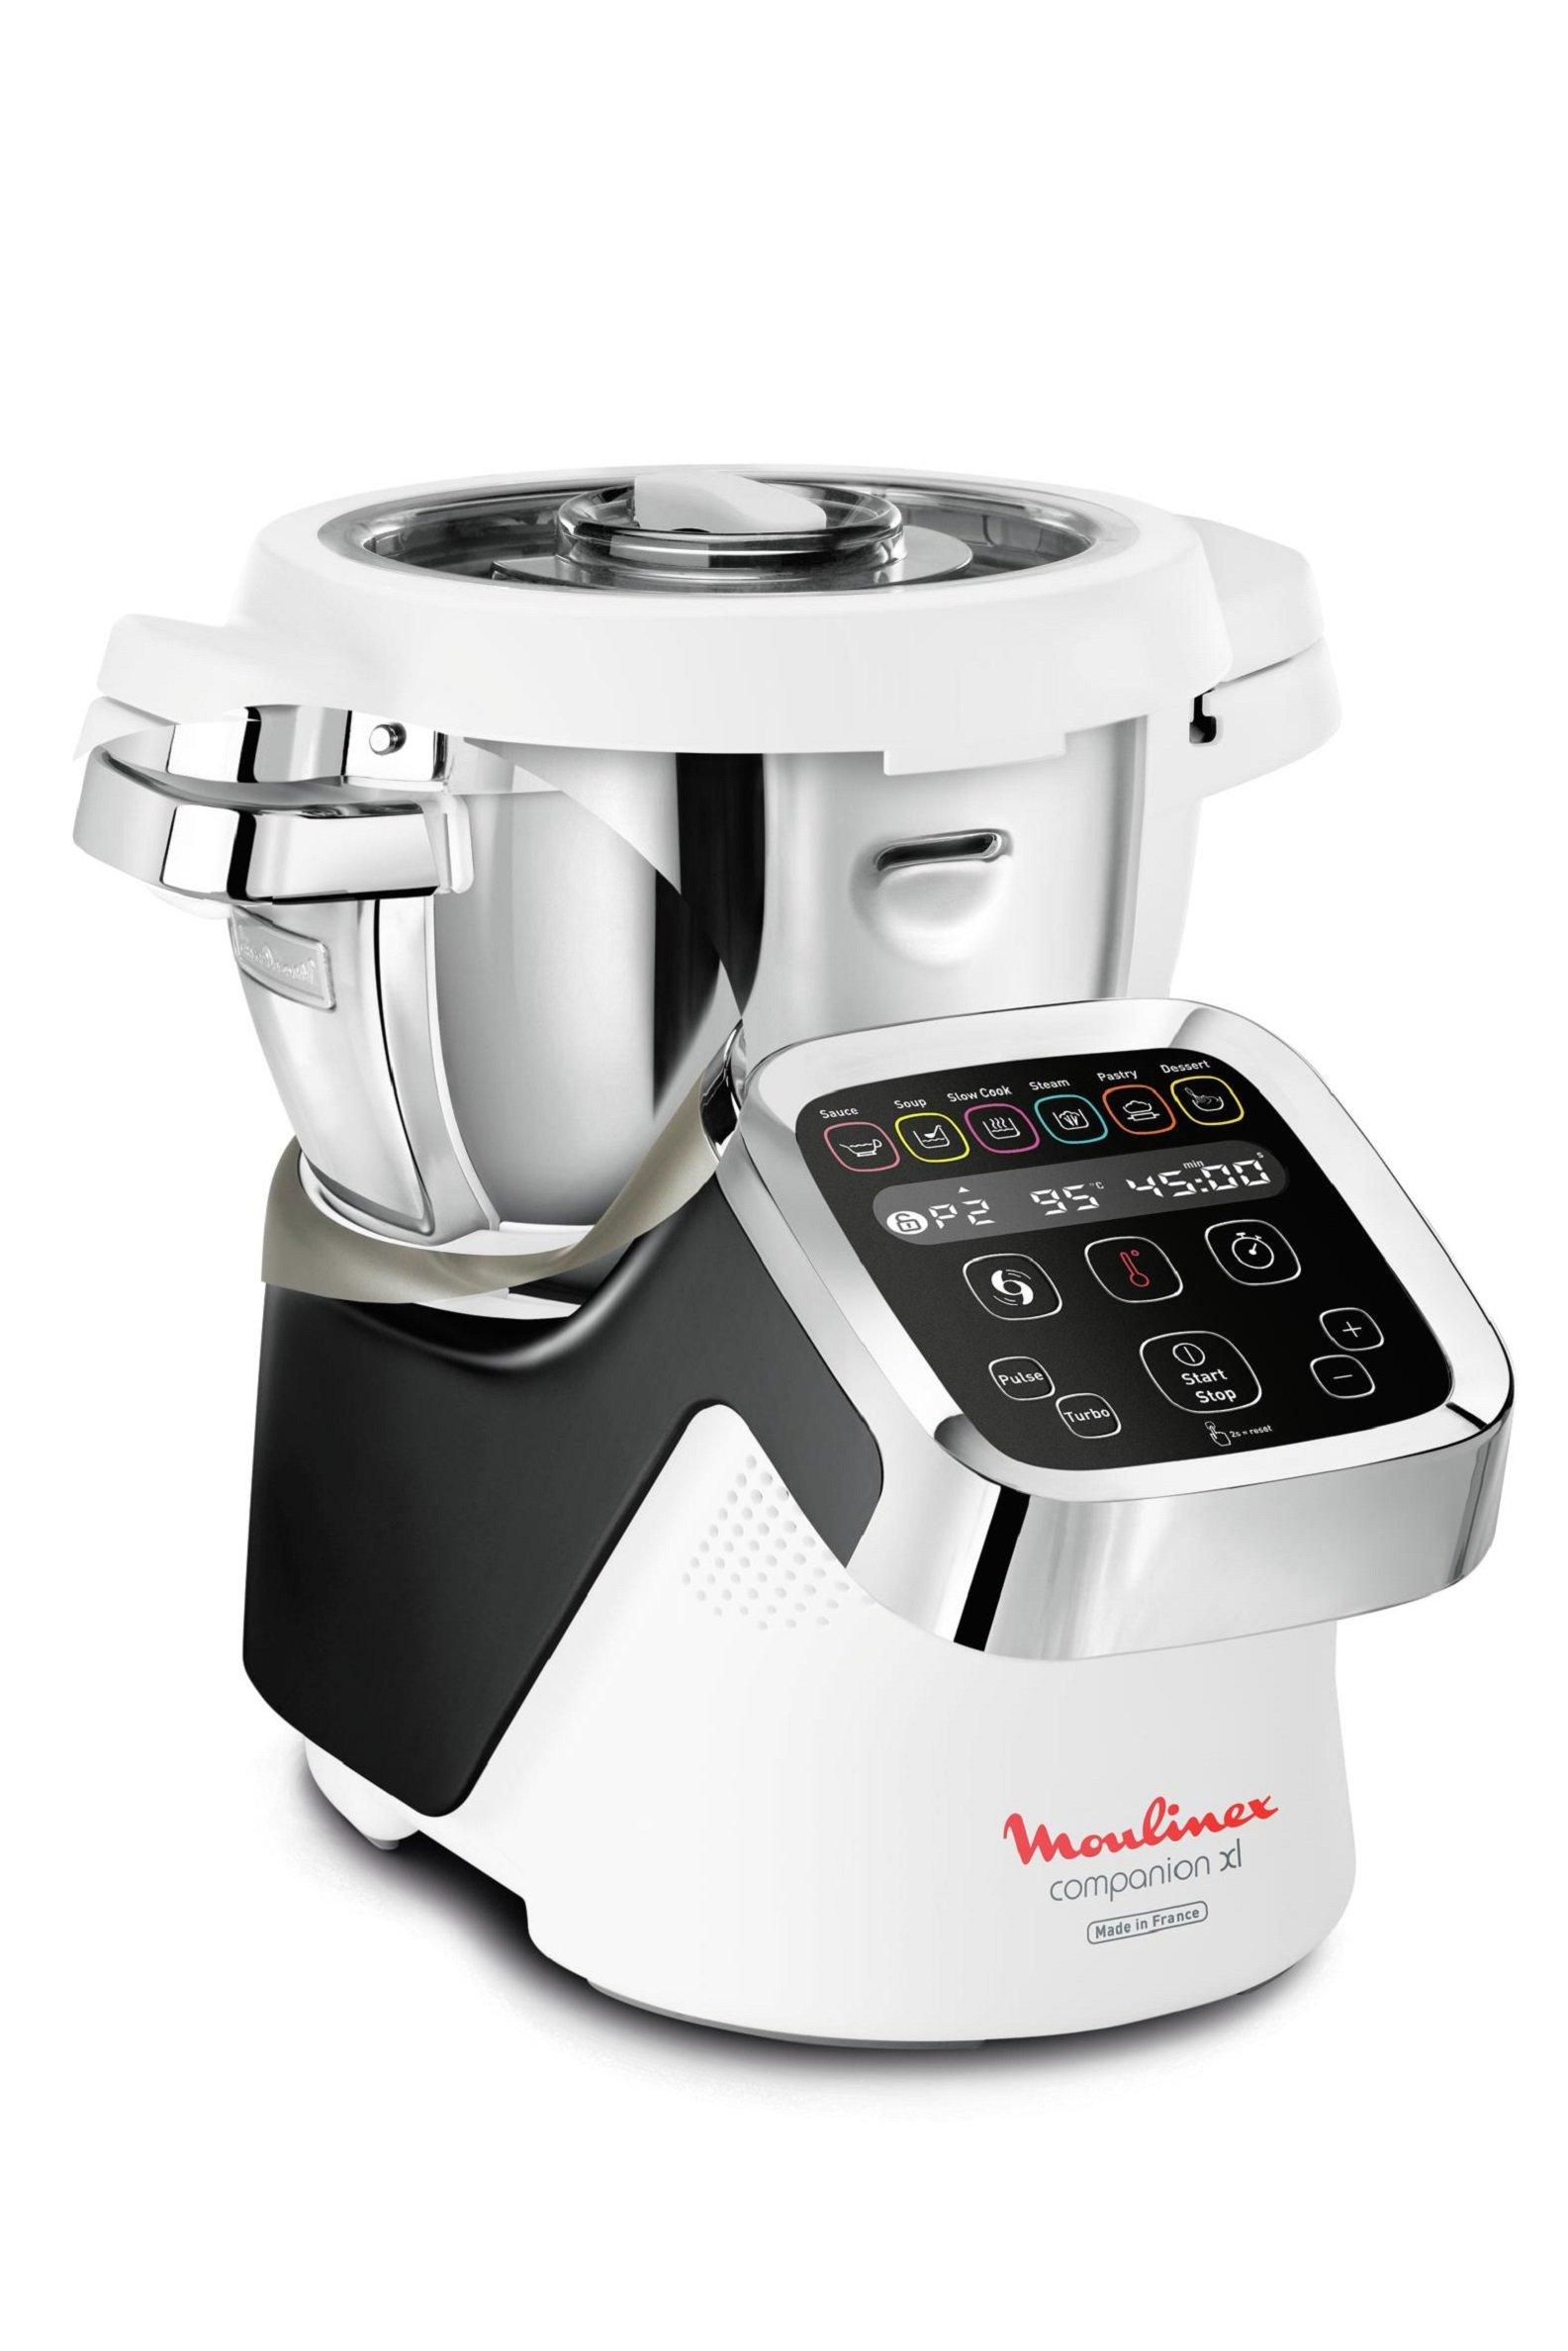 Moulinex-HF806E10-Roboter-Multifunktions-Kocher